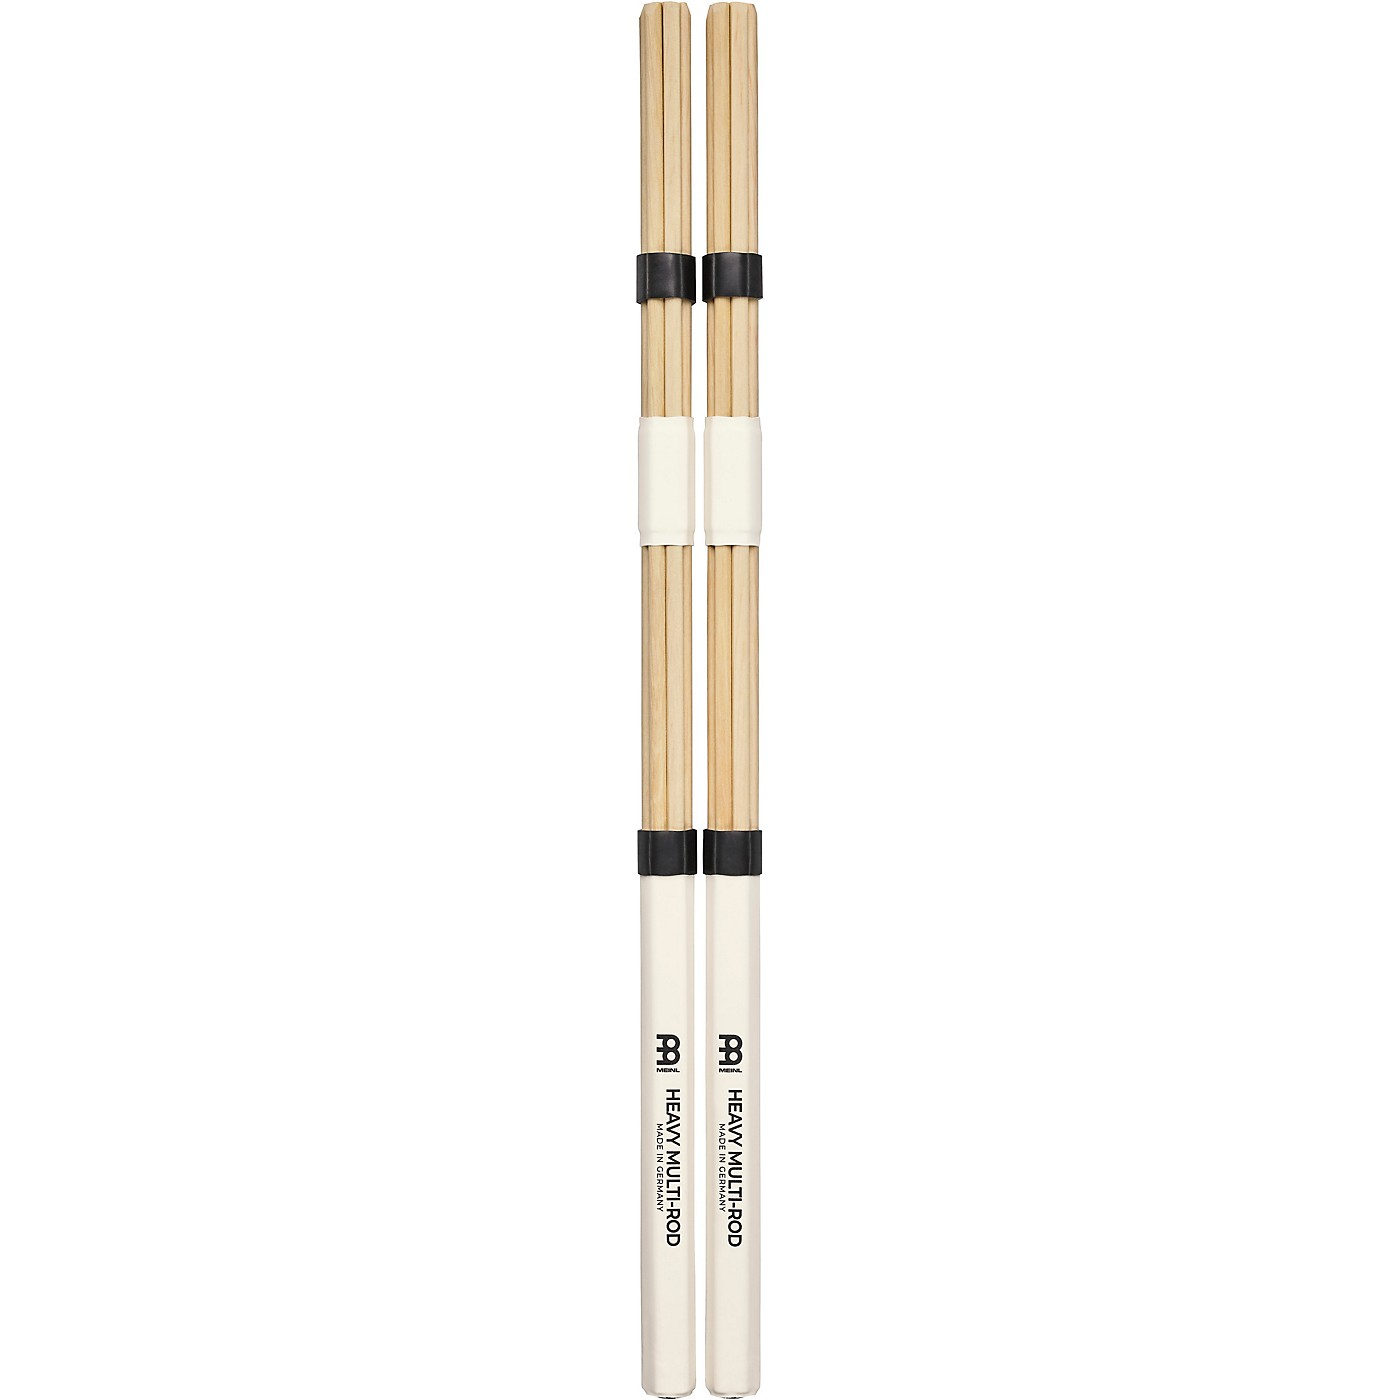 Meinl Stick & Brush Heavy Multi-Rods thumbnail